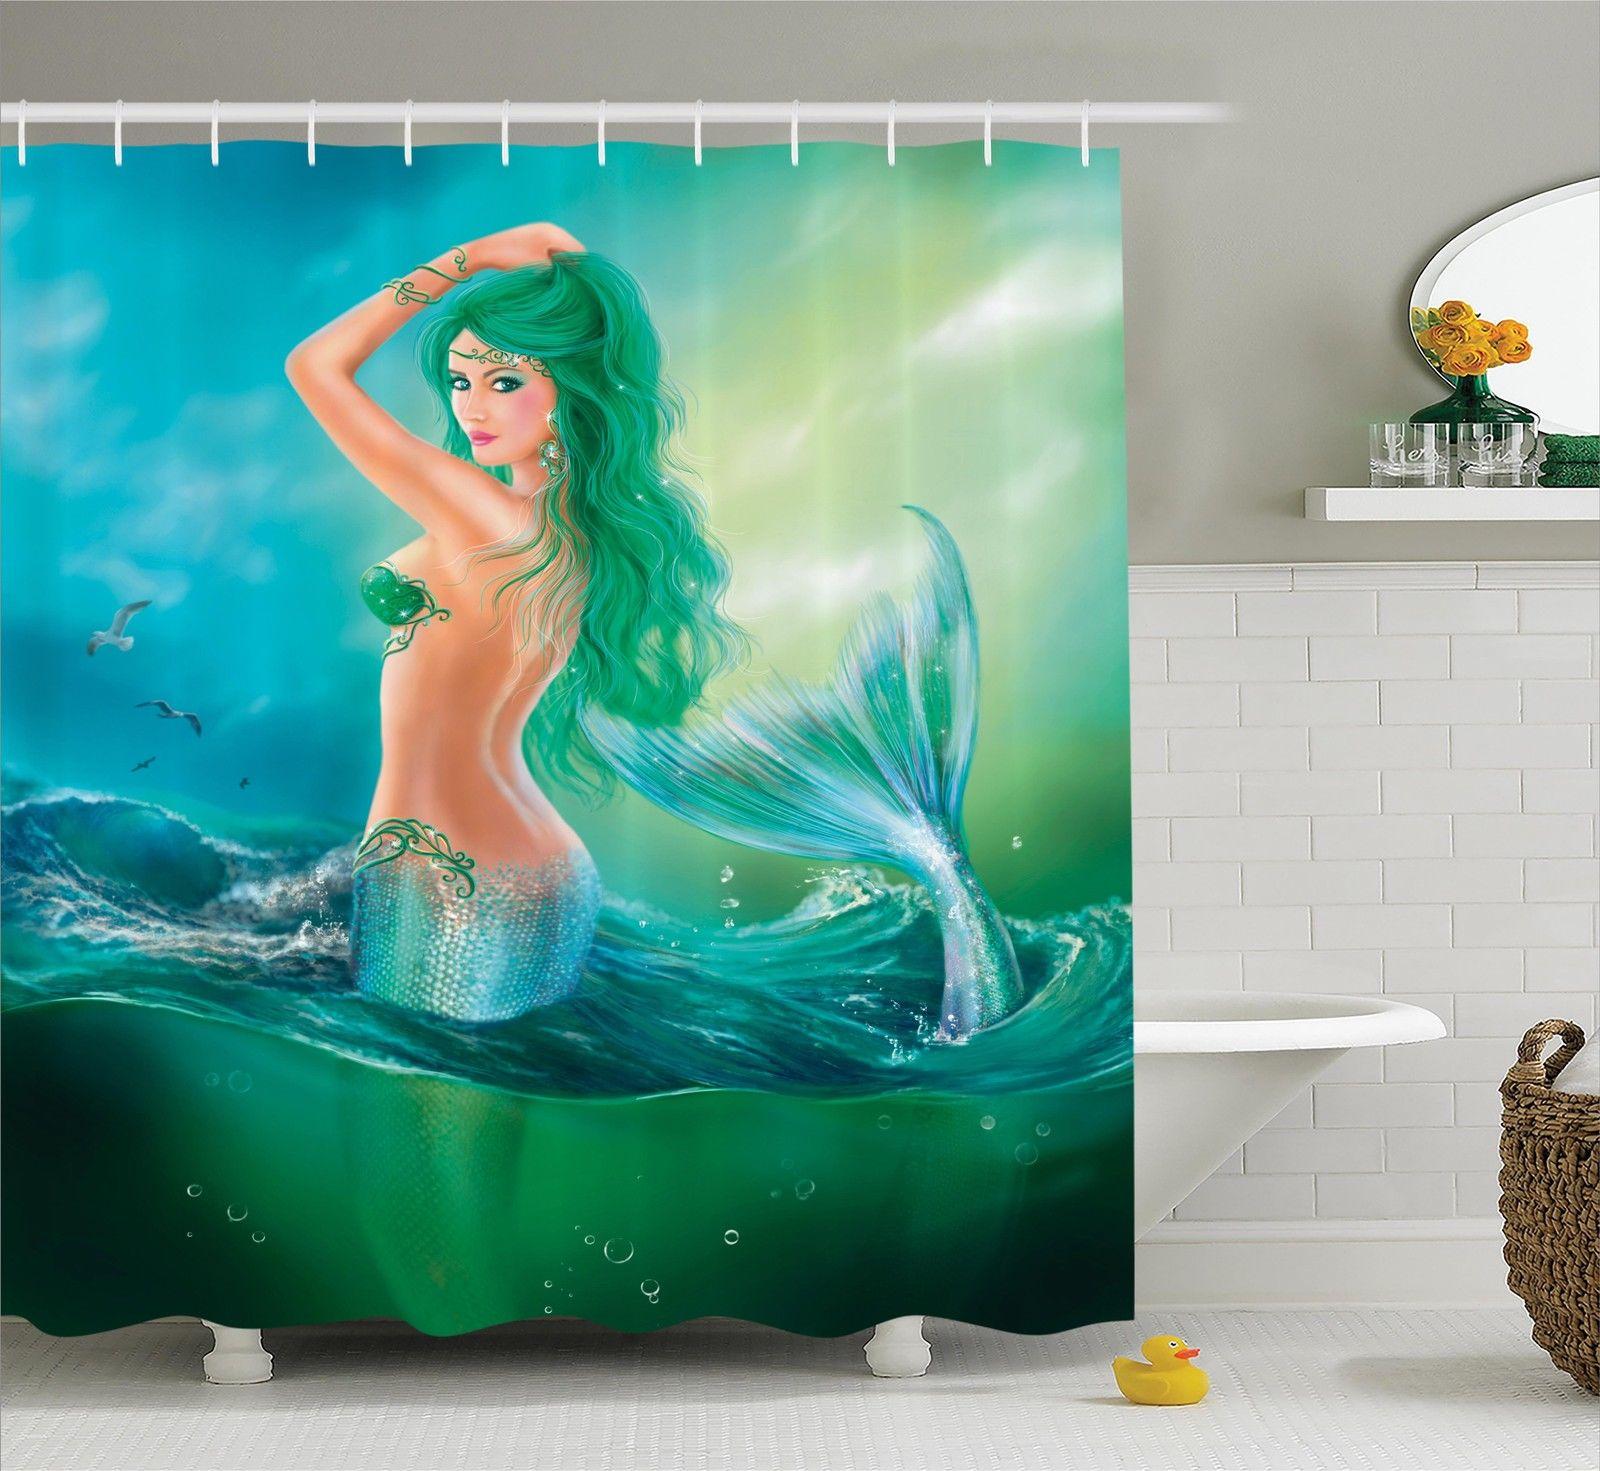 Mermaid Decor Shower Curtain Set, Mermaid In Ocean On Waves Tail Sea  Creatures Dramatic Sky